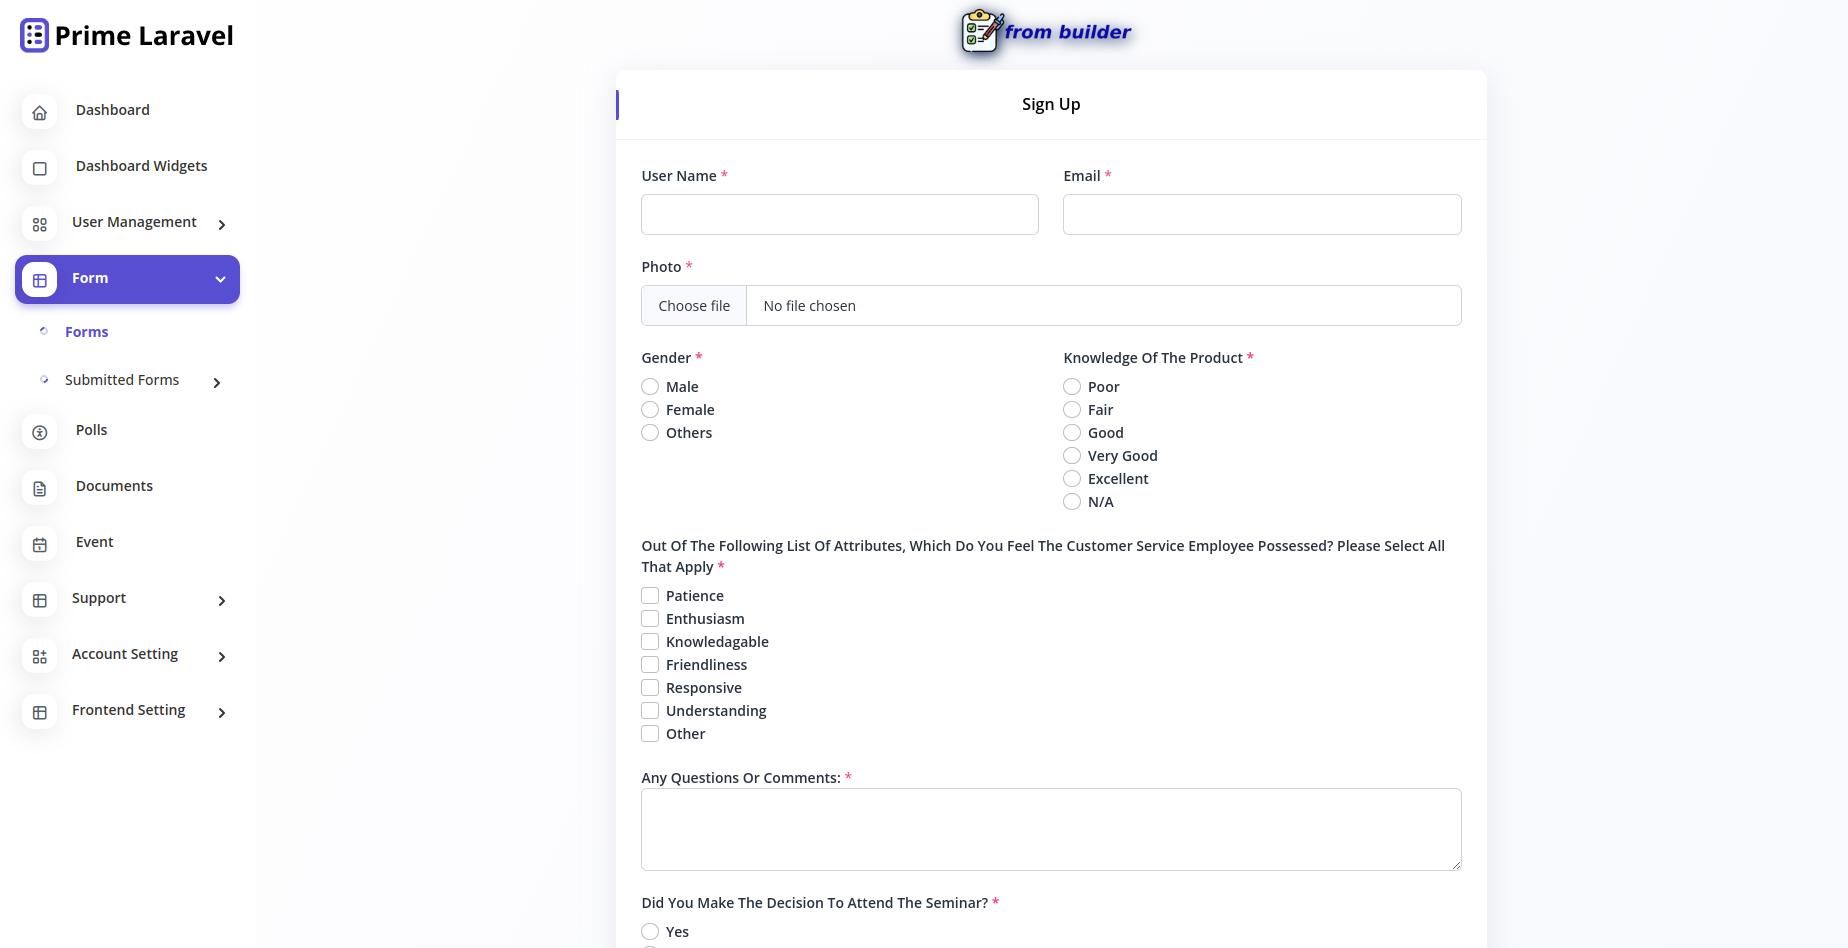 Prime Laravel Form Builder - Form builder, Users, Role, Permissions & Settings - 7